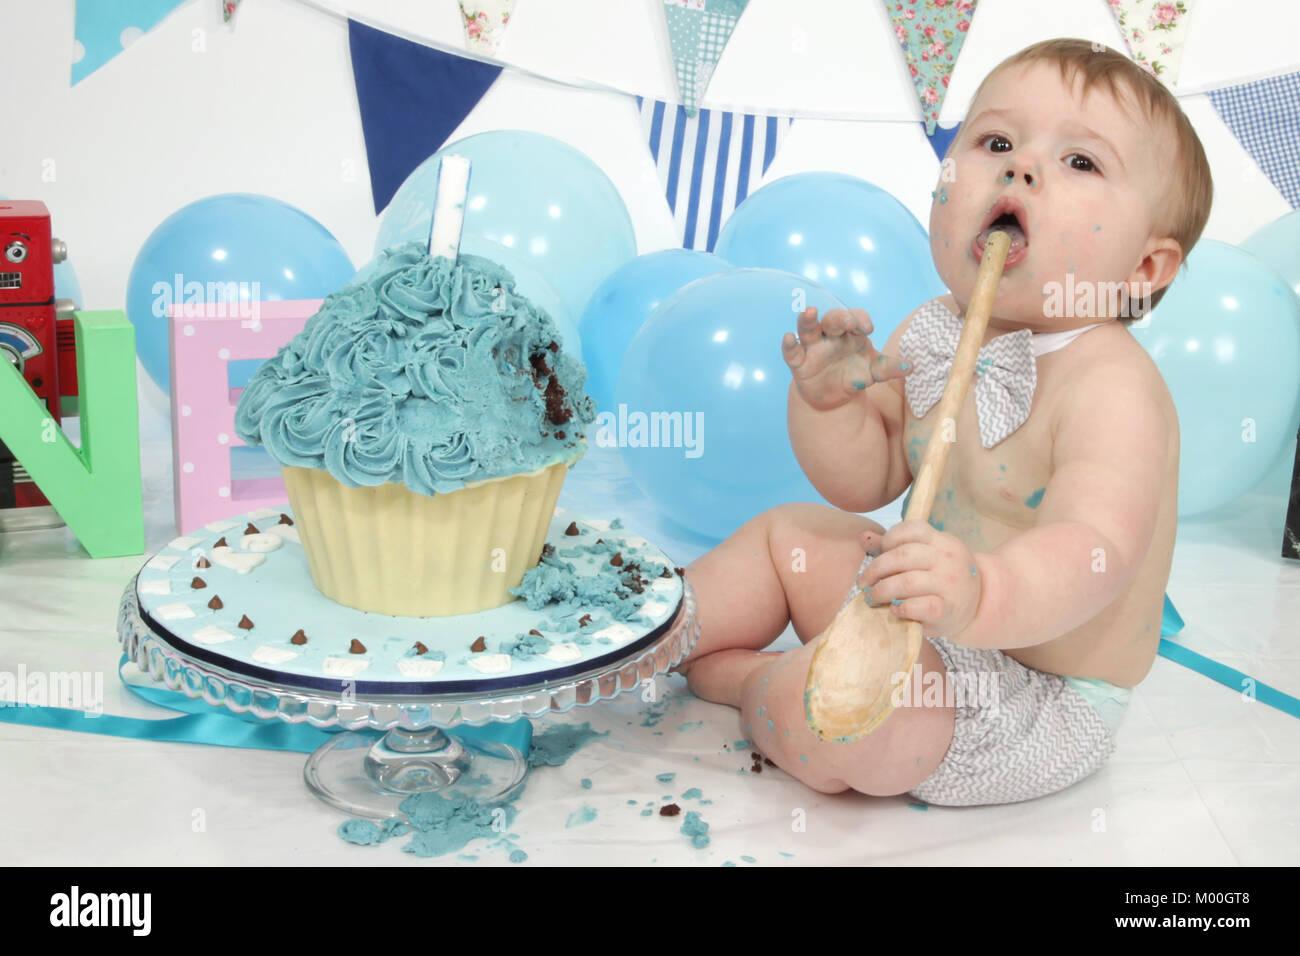 Stupendous 1 Year Old Boy Birthday Party Cake Smash Fun Food Stock Photo Funny Birthday Cards Online Elaedamsfinfo